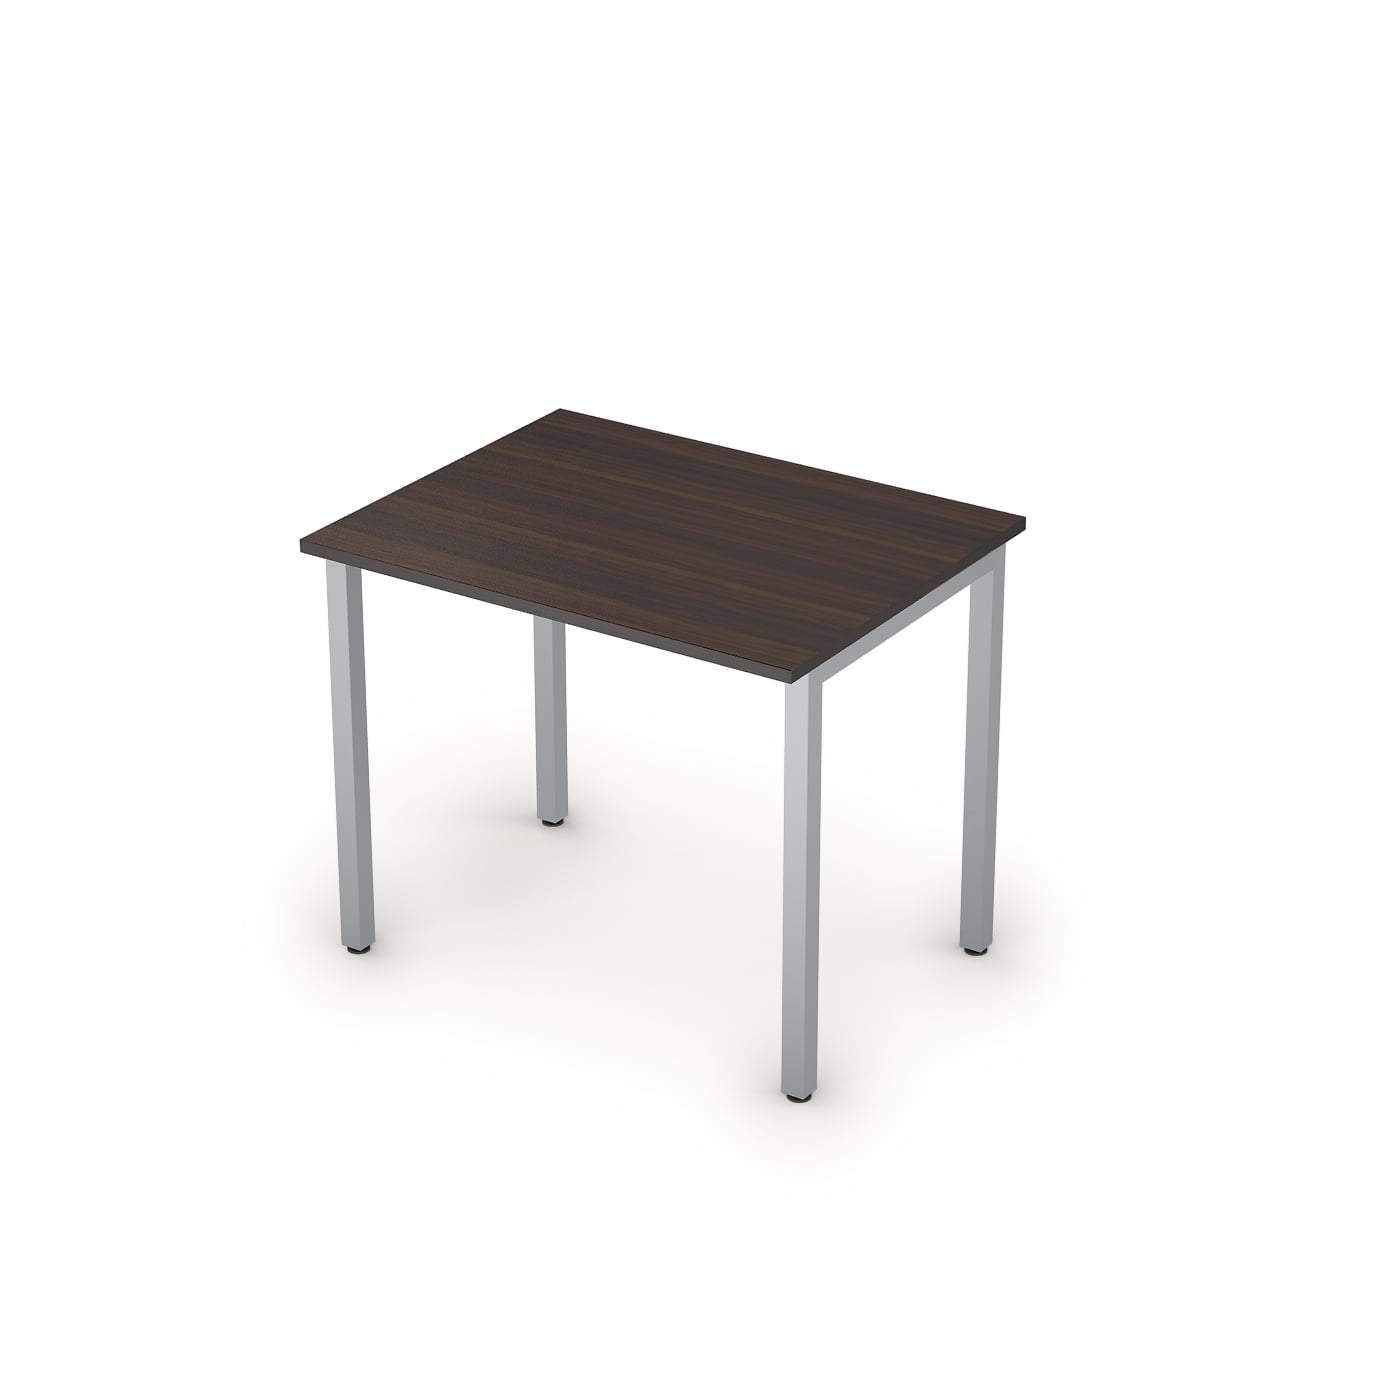 Столы на металлических опорах без экрана  900х700х750